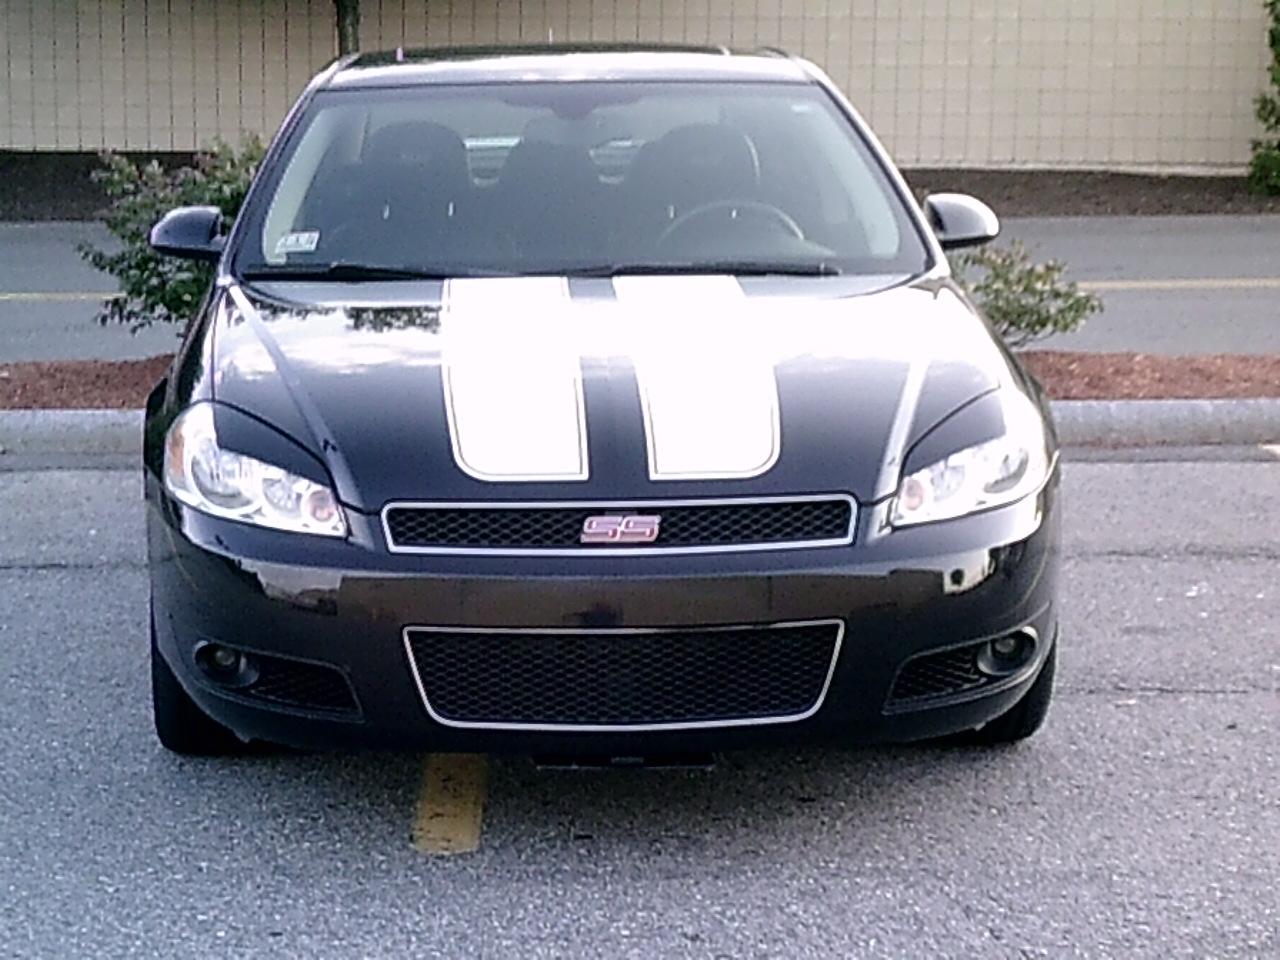 Impala 2009 chevy impala body kit : Vinyl Stripes - Page 2 - Chevy Impala Forums